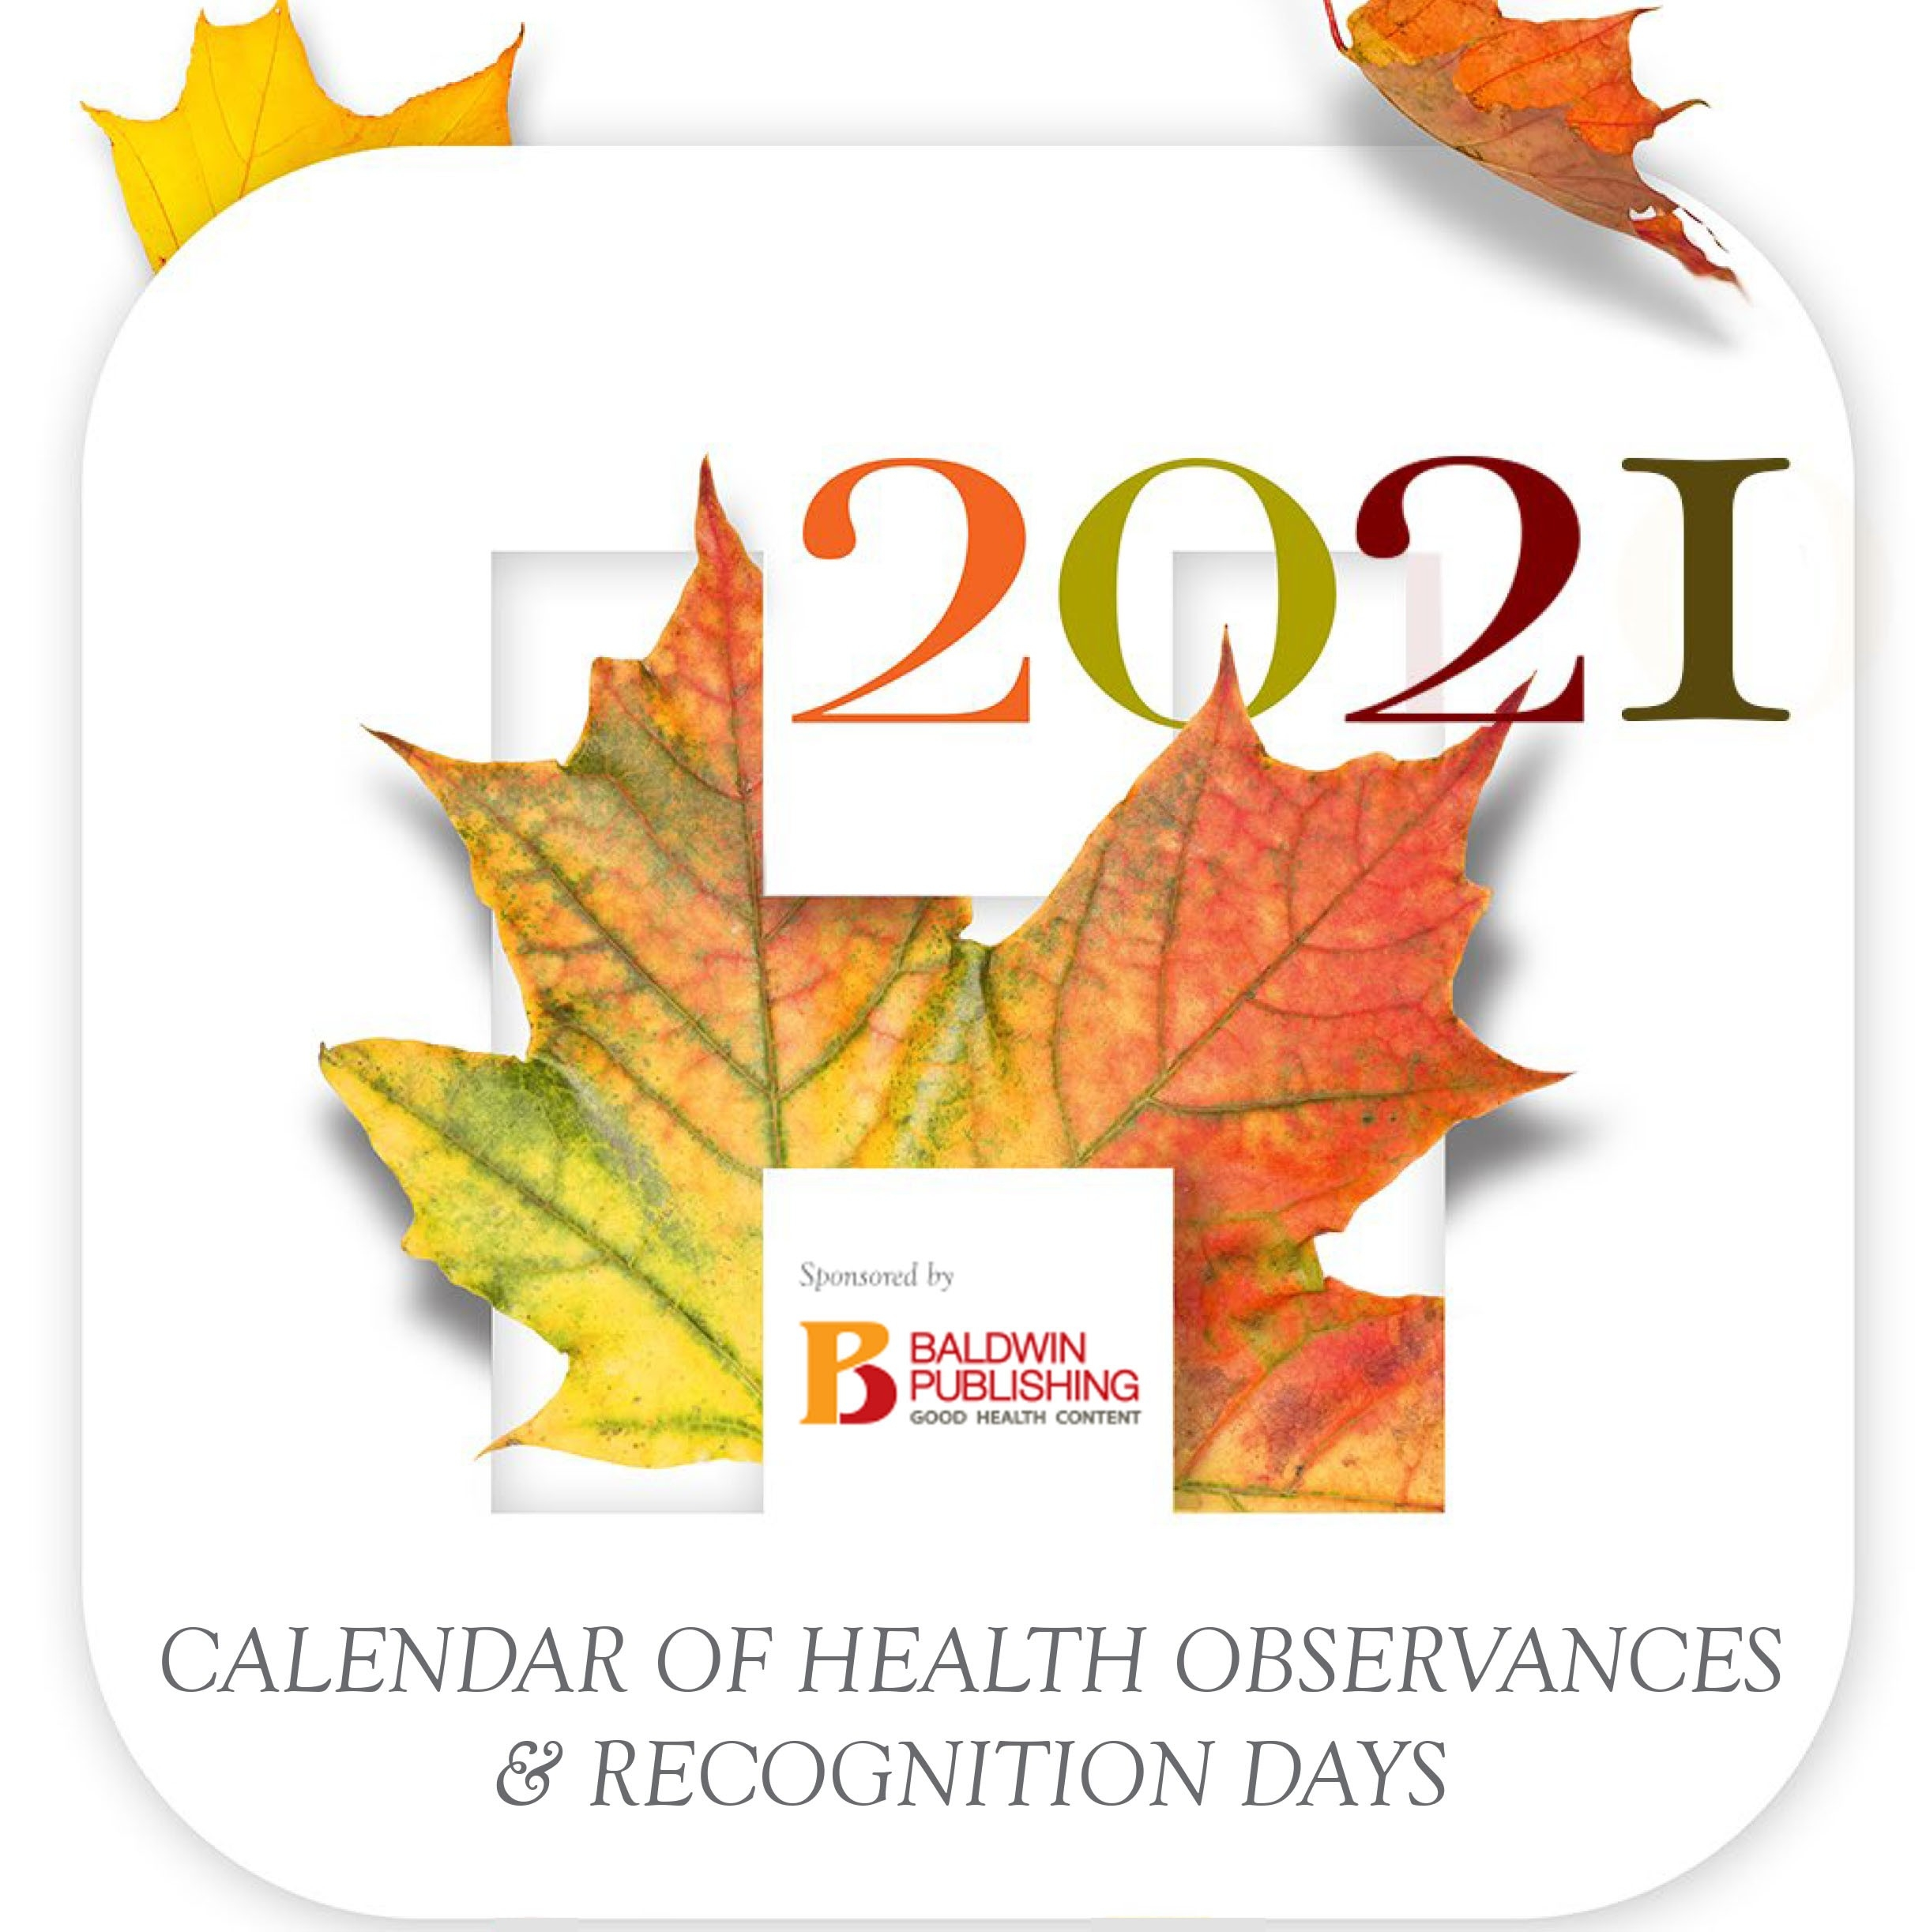 Baldwin Publishing Sponsors 2021 Health Observances Calendar-Printable Healthcare Awareness Calendar 2021